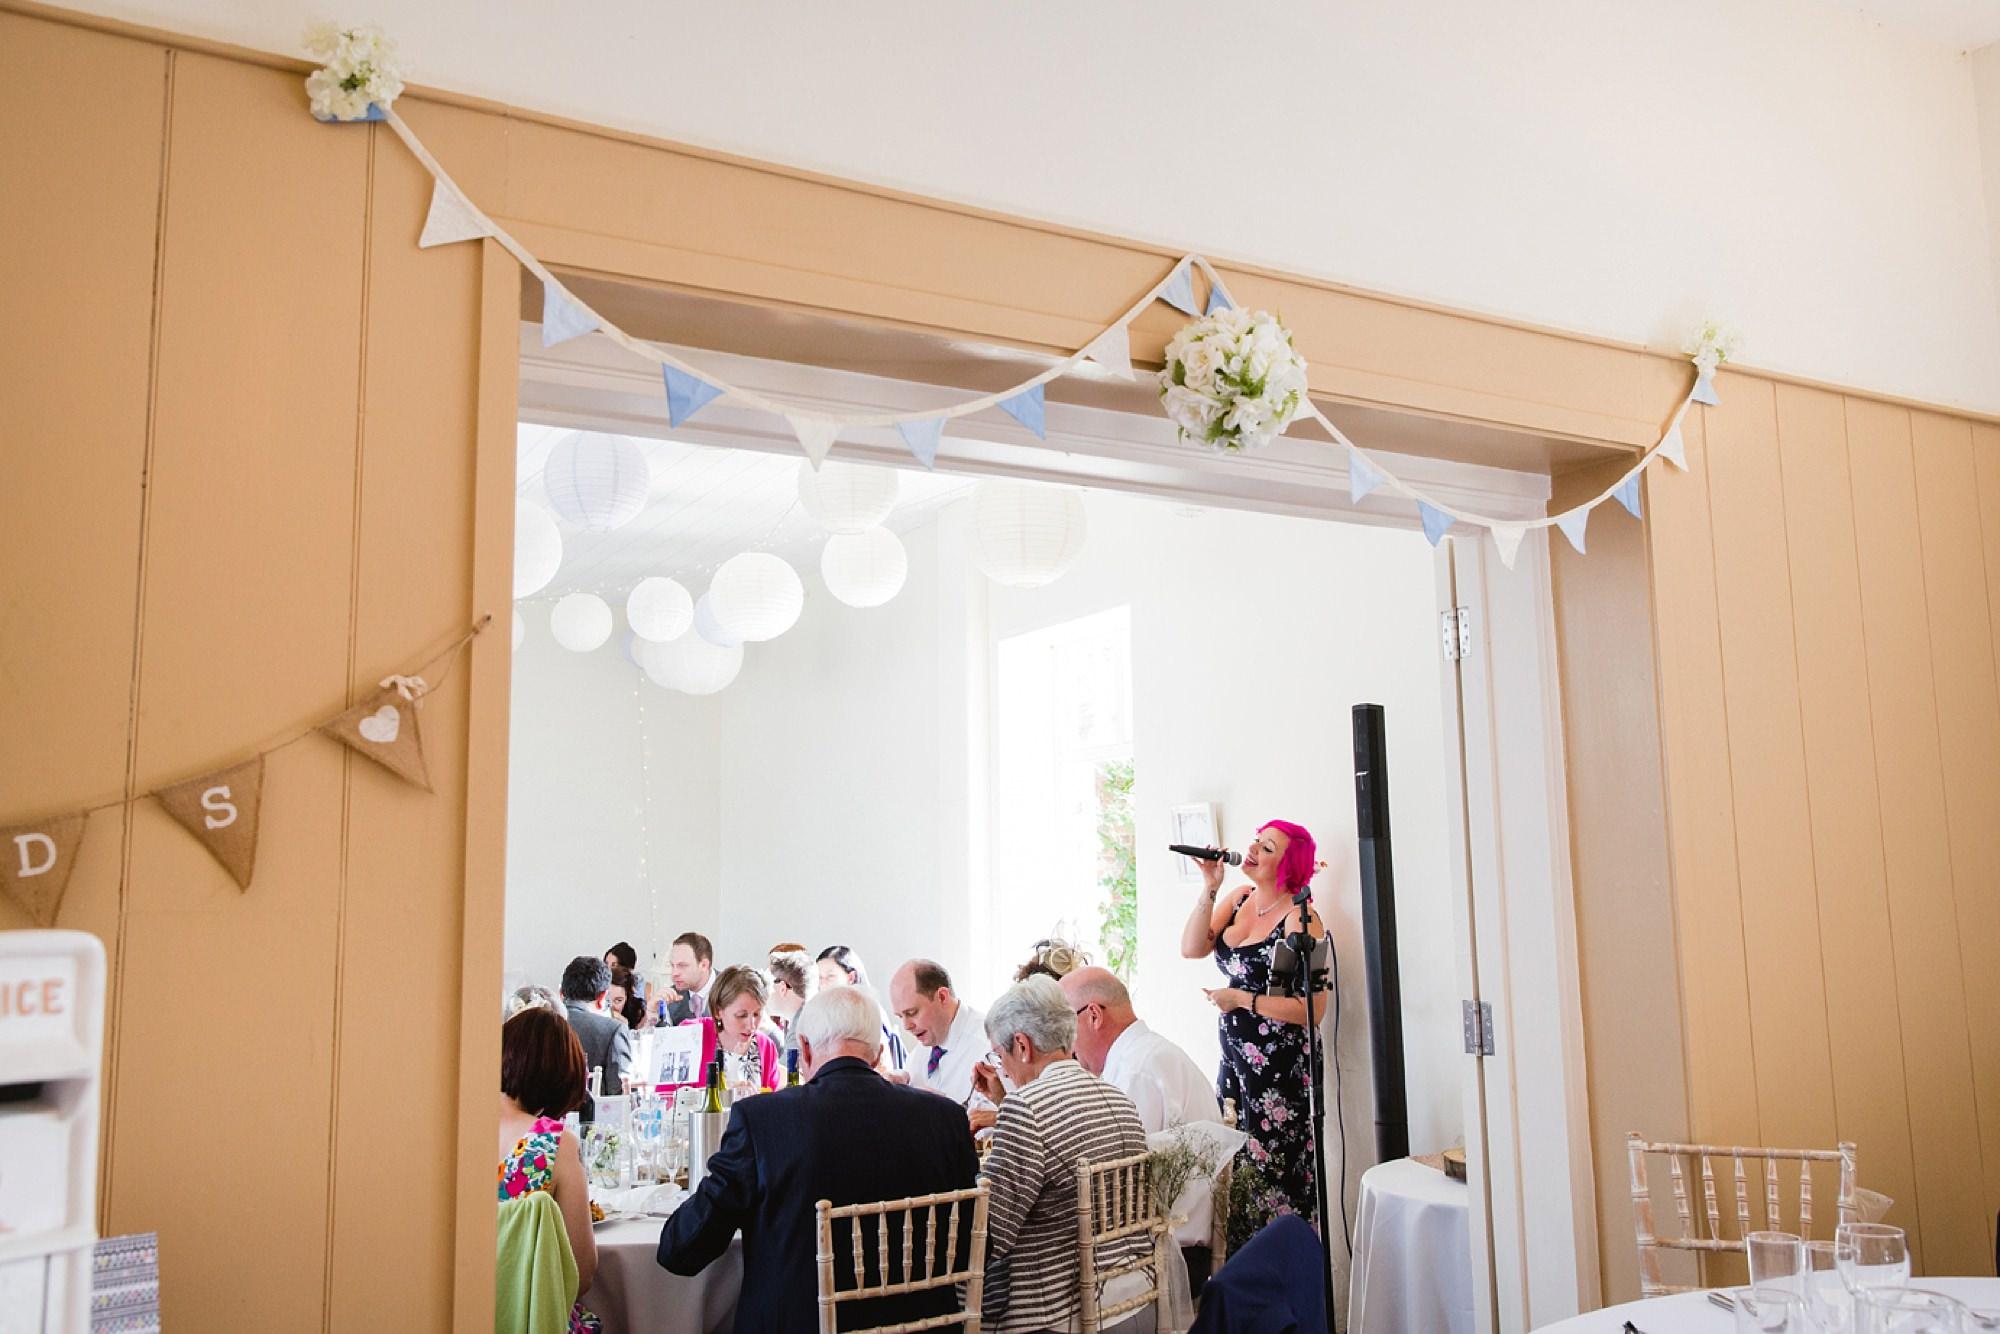 Bignor Park wedding photography singer during meal